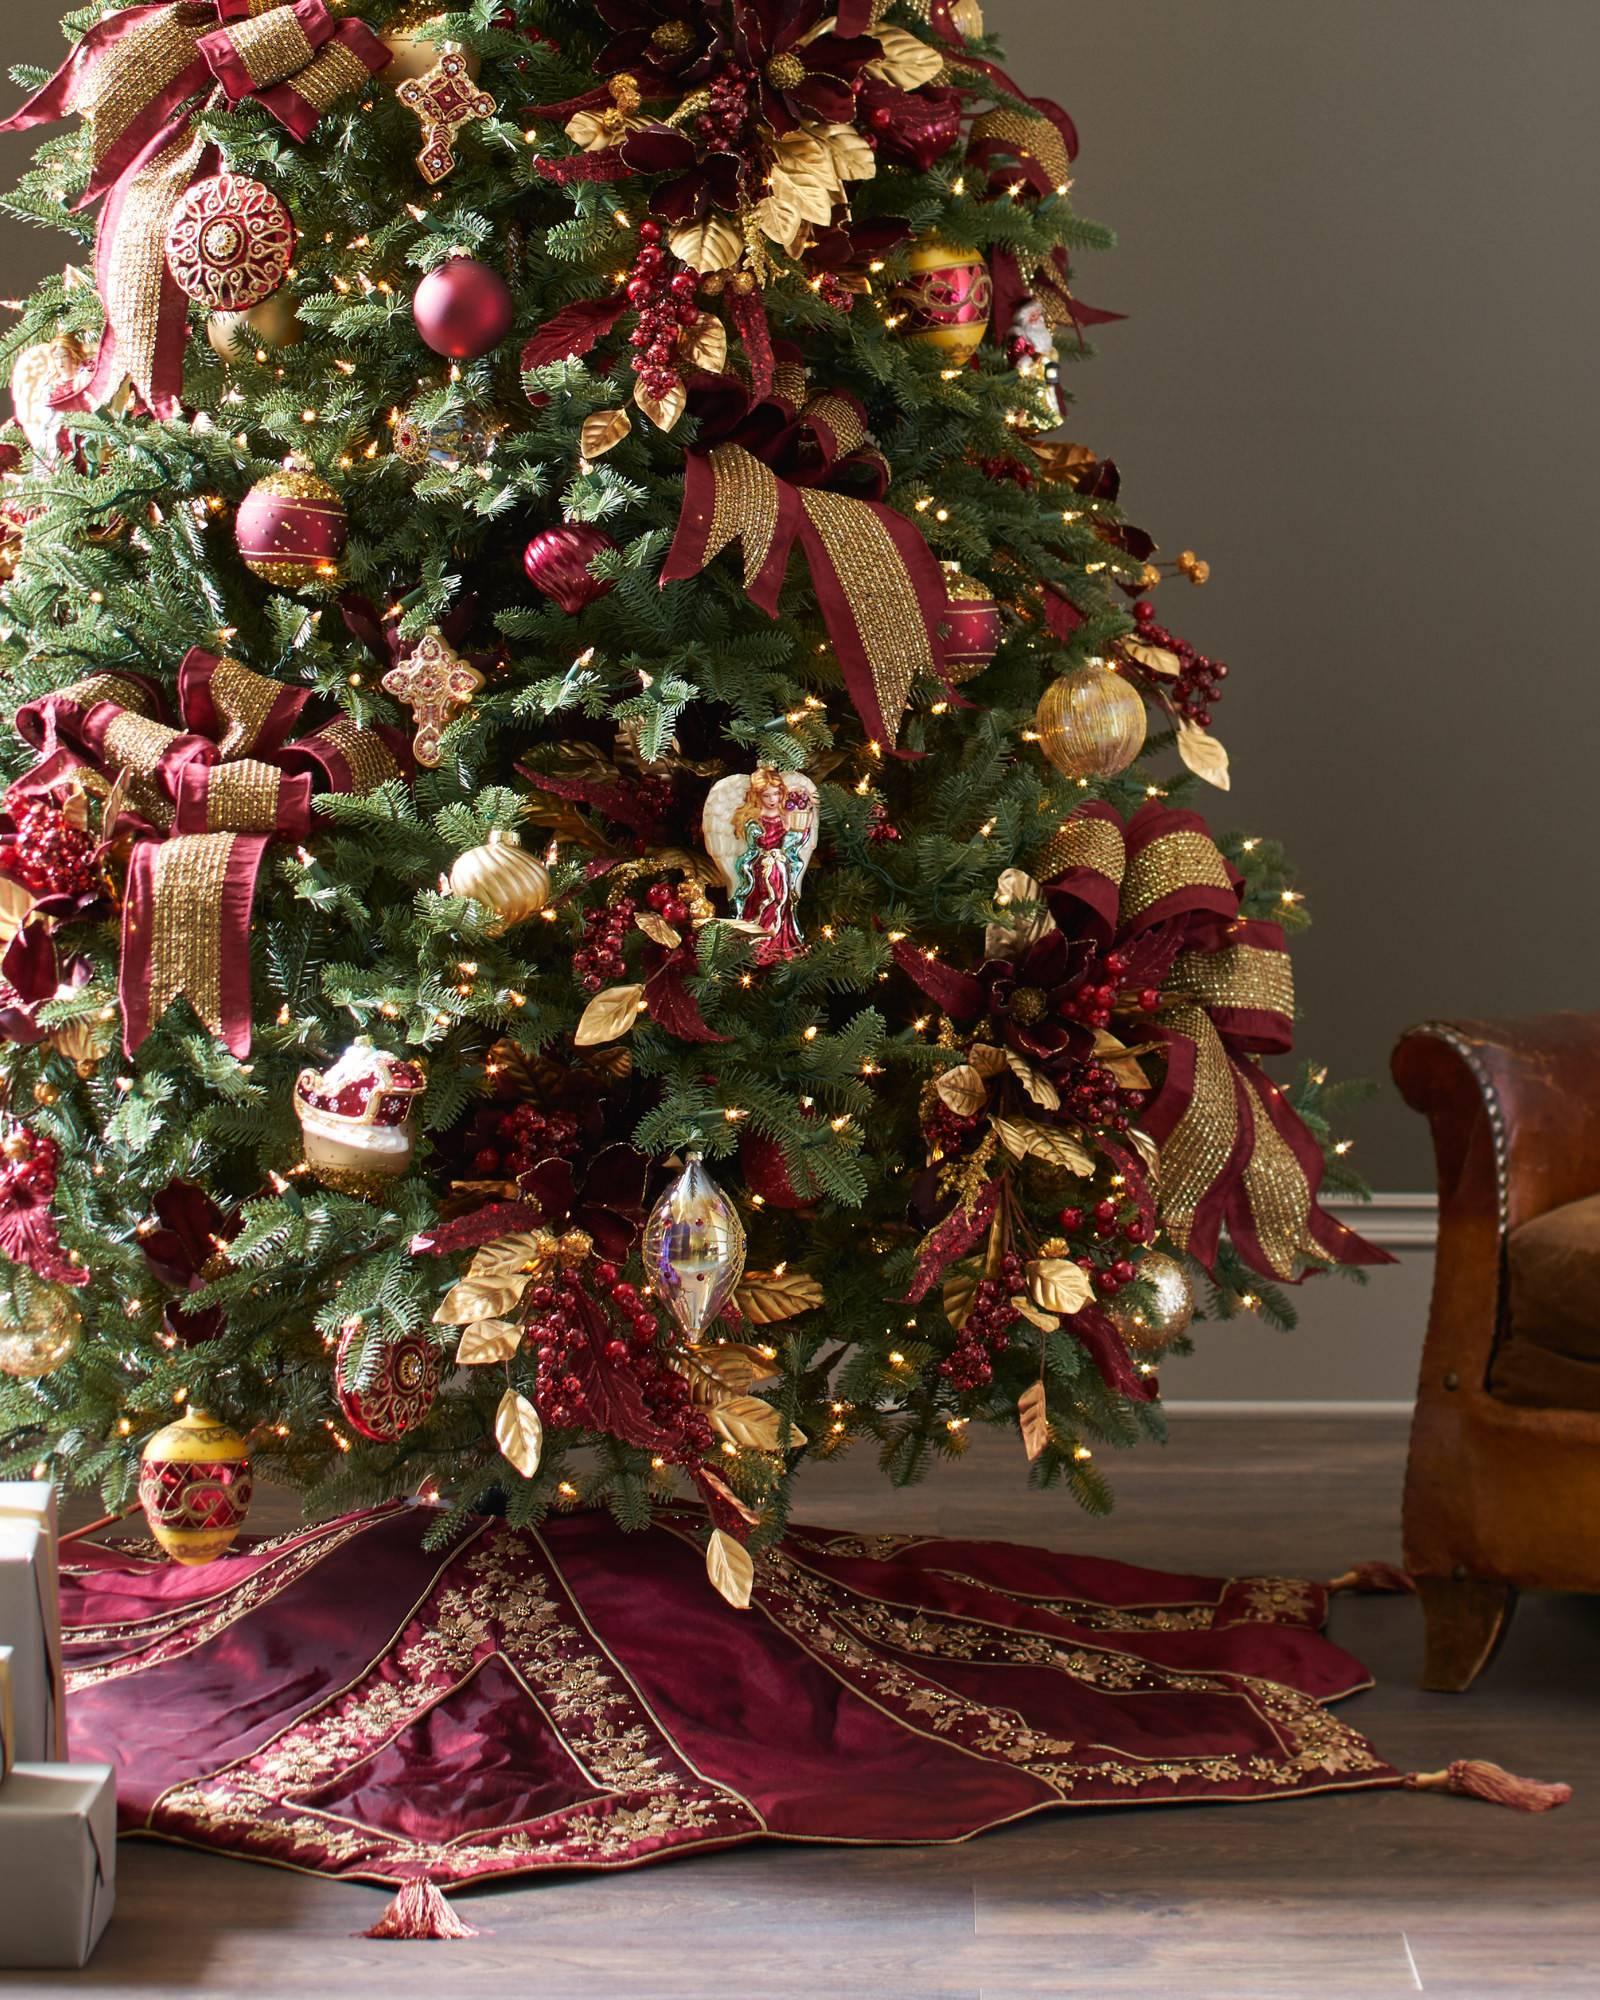 Christmas ornament sets for tree -  Alt Noel Glass Ornament Set